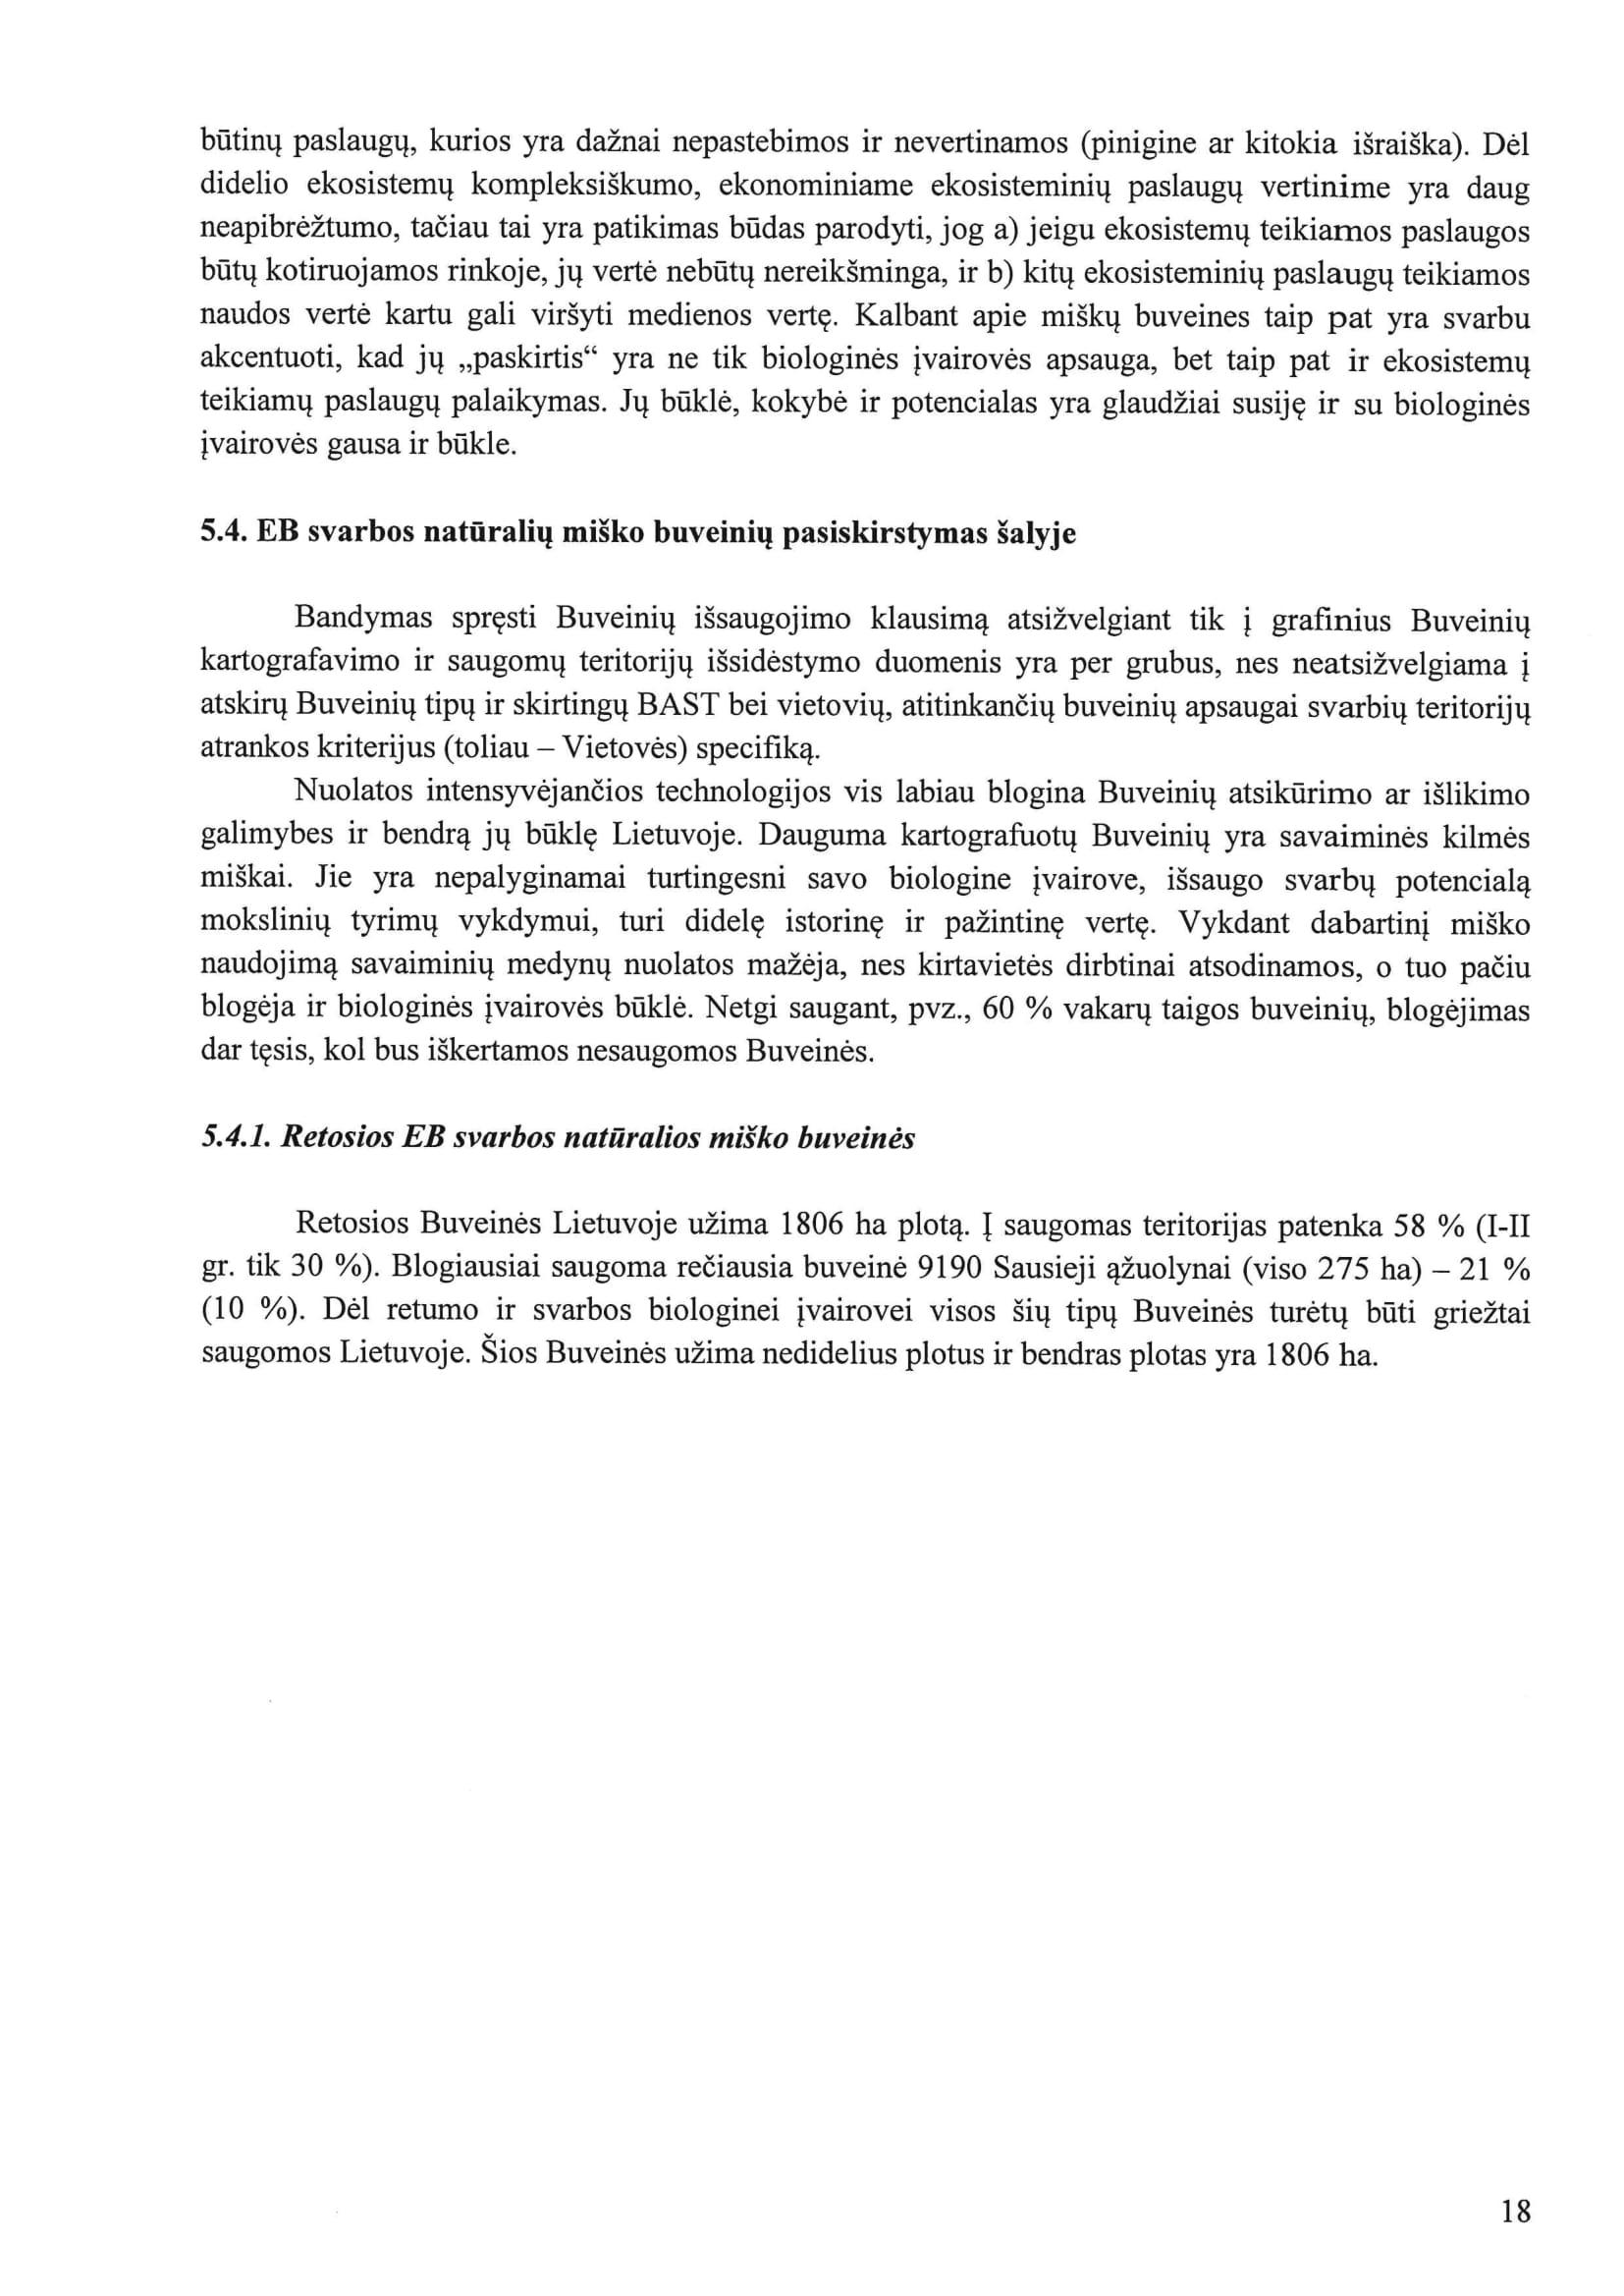 EB buveiniu Pazyma VMT VMU VSTT 2019.01.23 (su parasais)[38073]-18